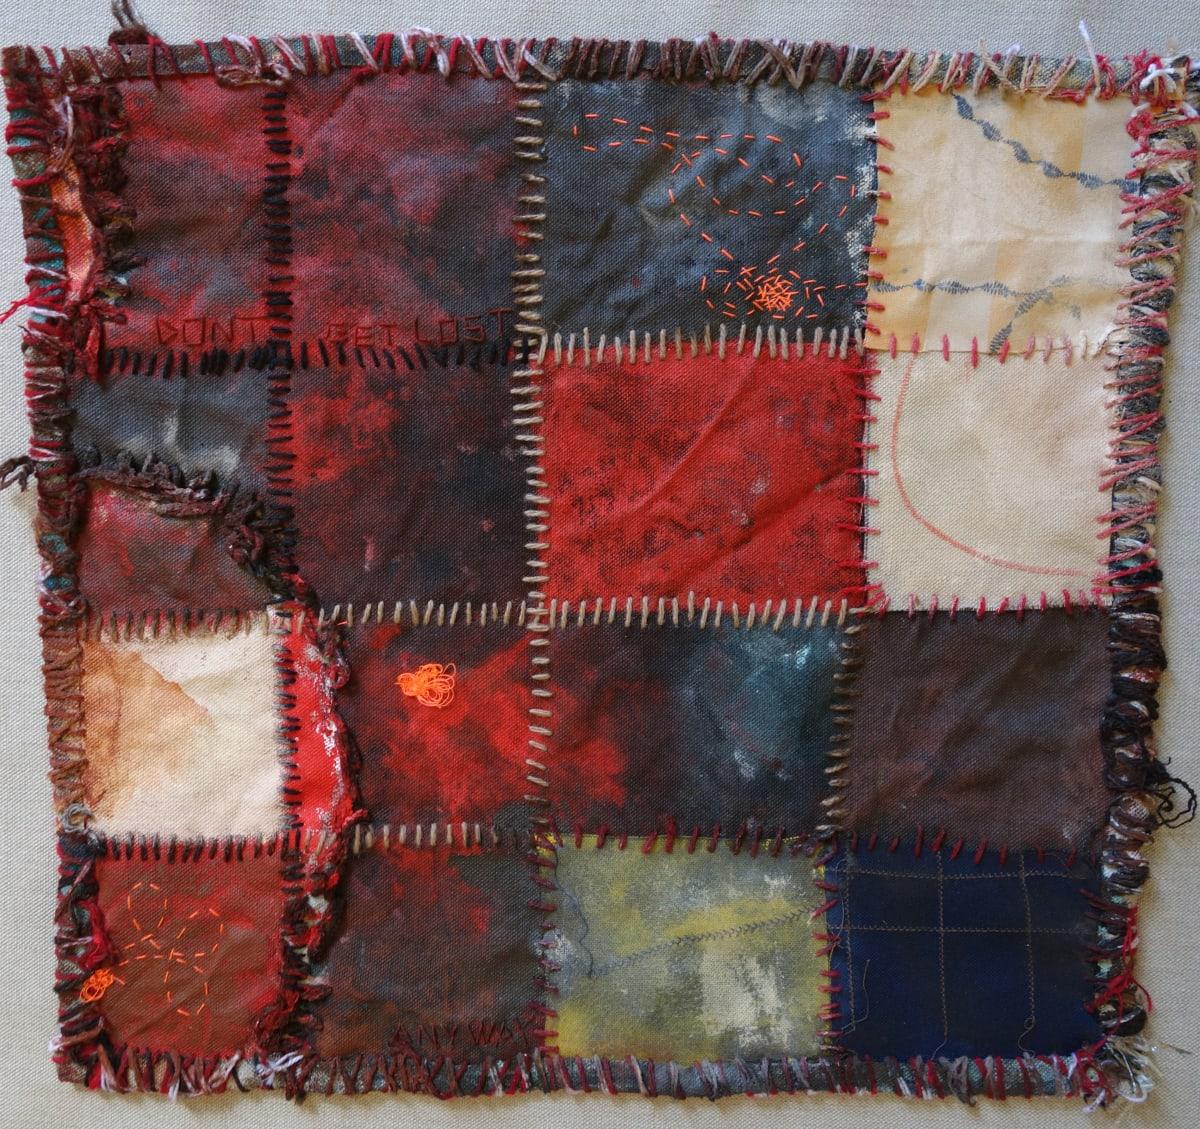 Stephen Eastaugh MUDMAPS 5 (Don't get lost anyway) Broome acrylic, thread, linen 45 x 45 cm